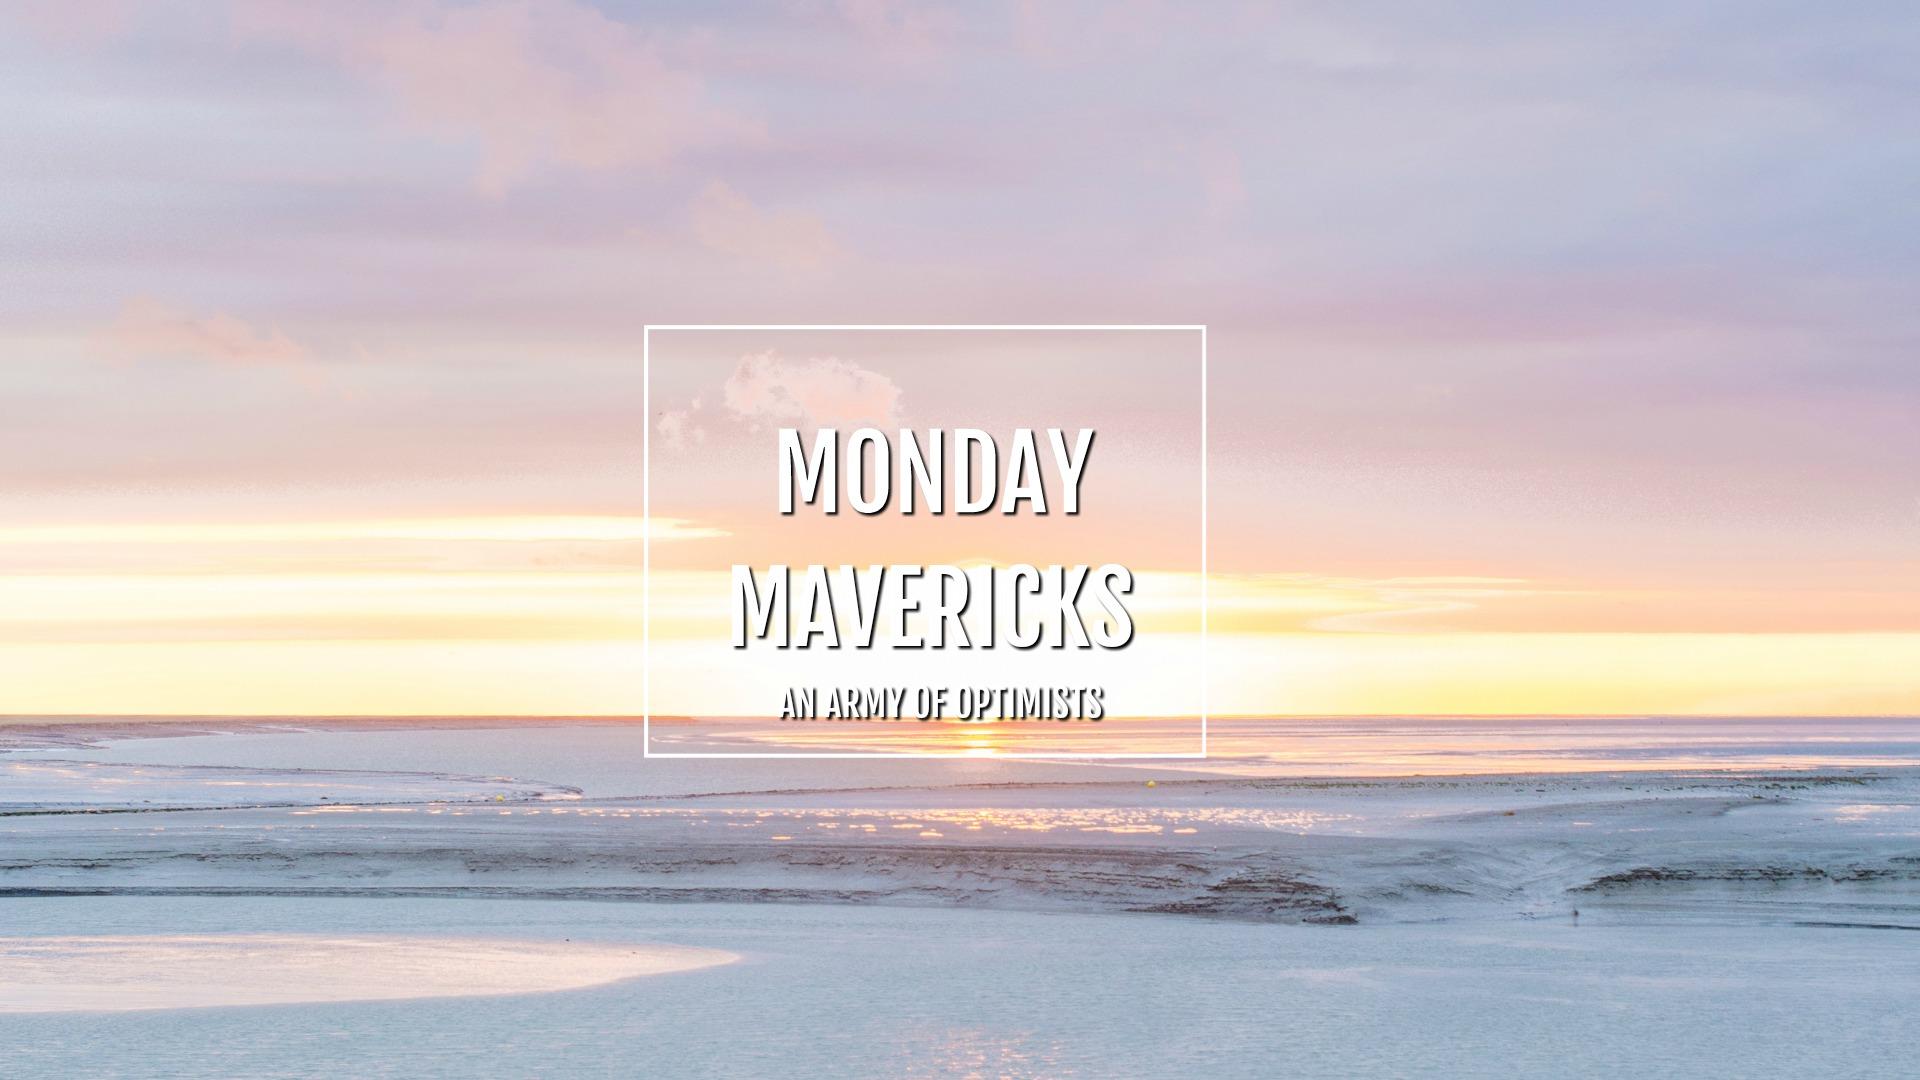 MONDAY MAVERICKS